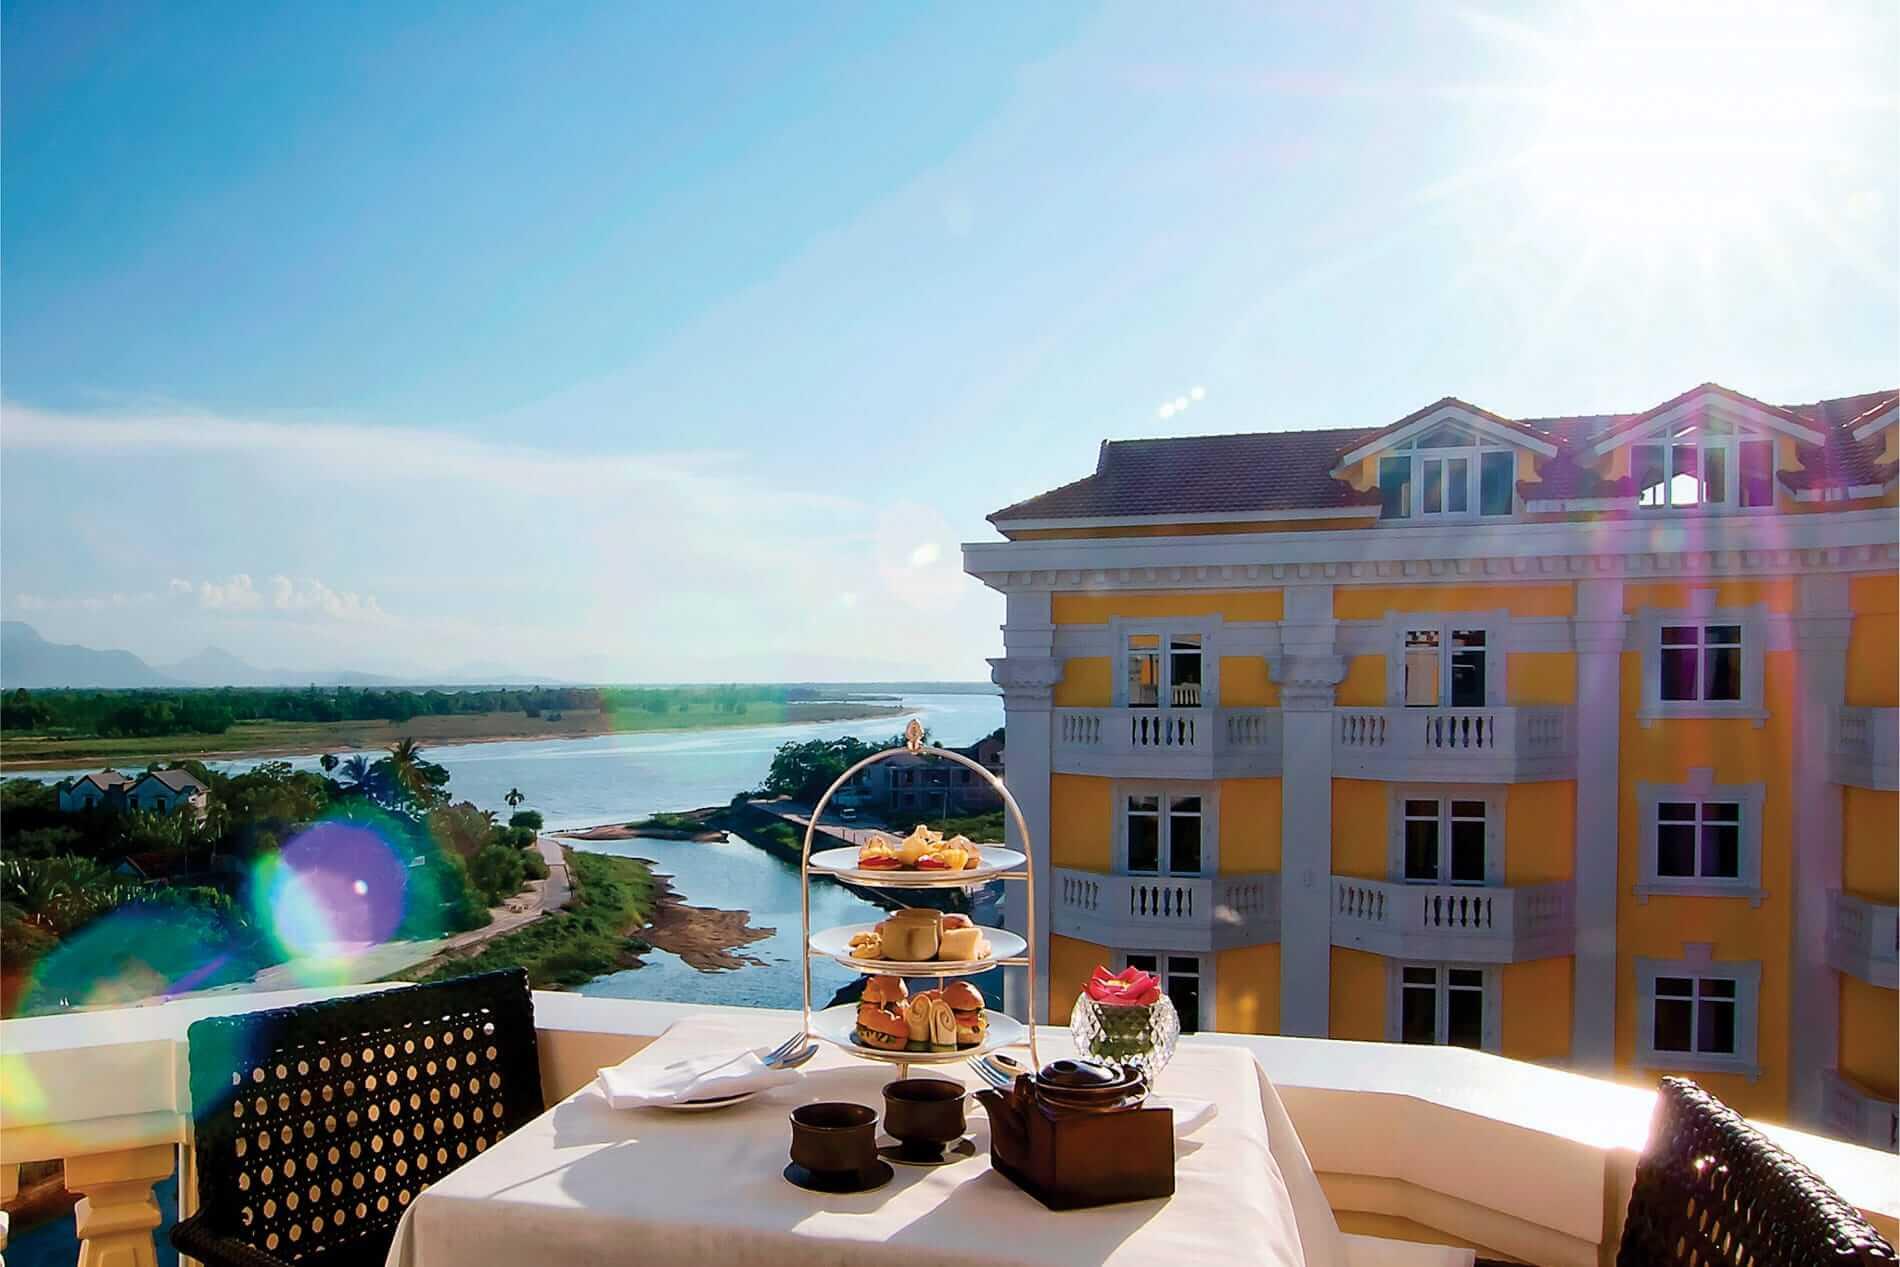 balcony setting at Woosah Spa in Hoi An